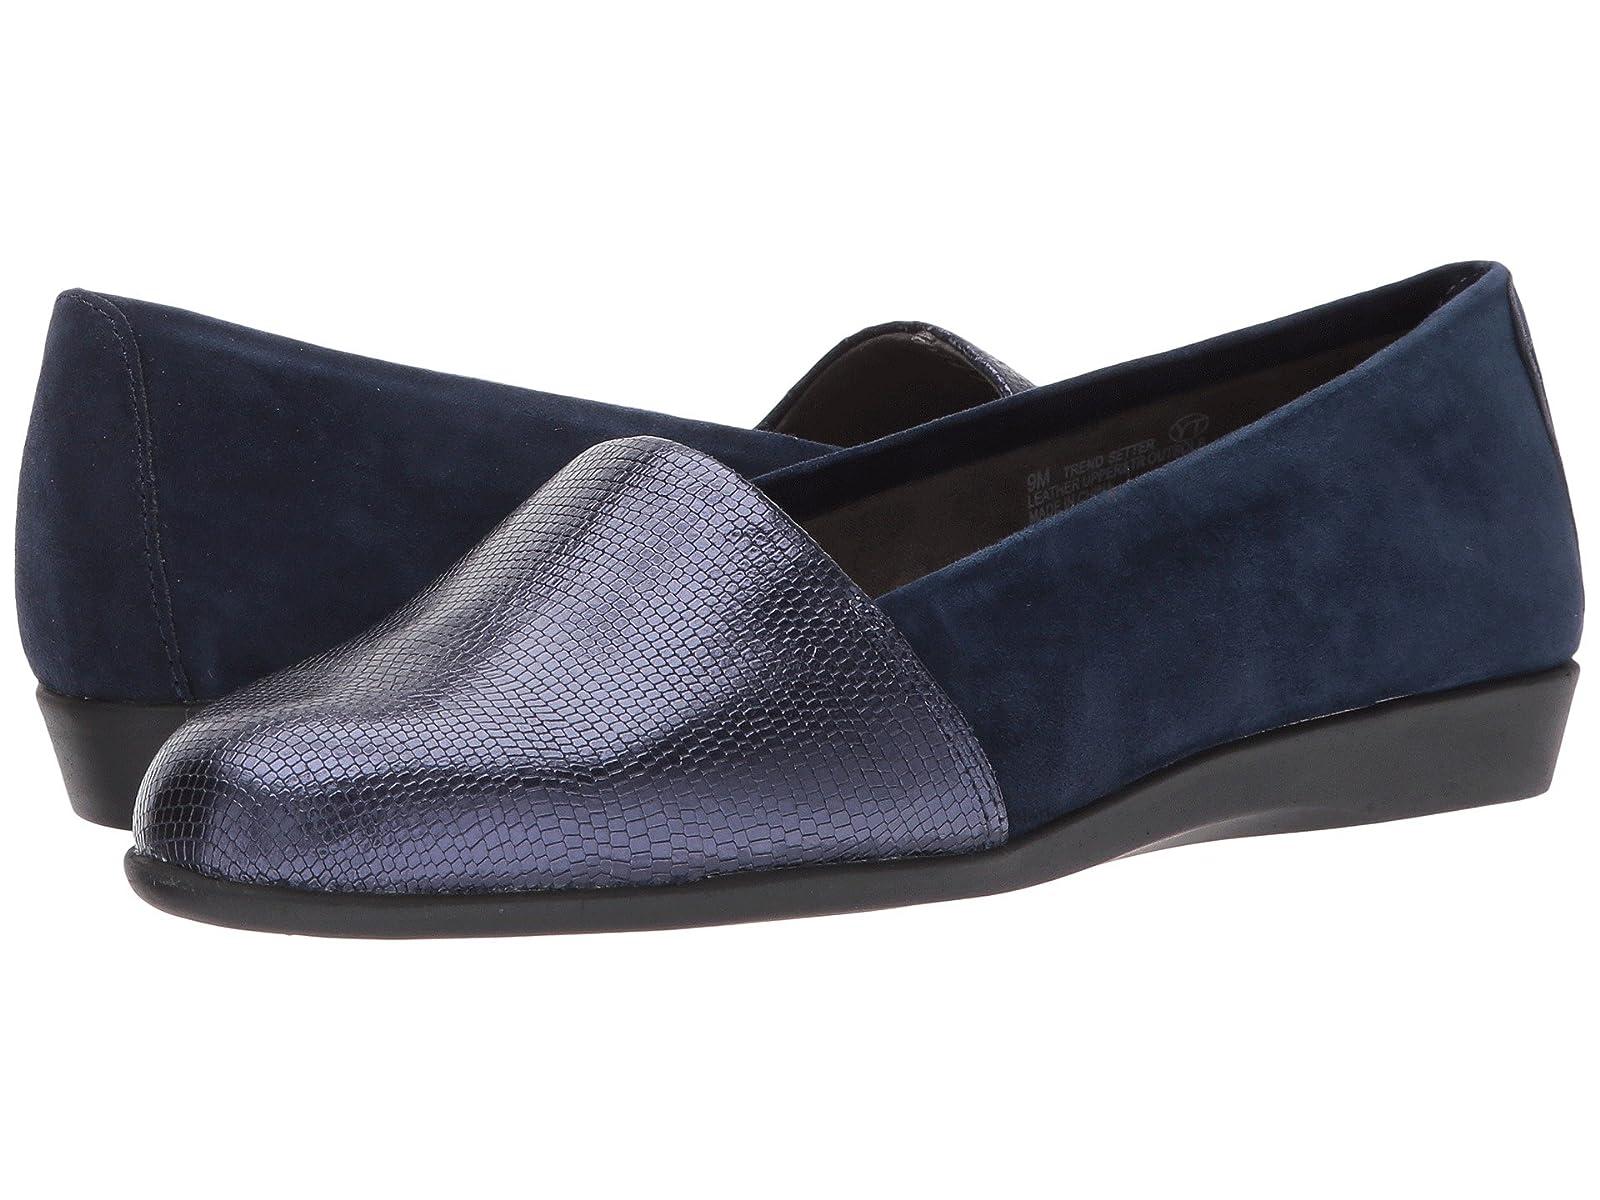 Aerosoles Trend SetterCheap and distinctive eye-catching shoes